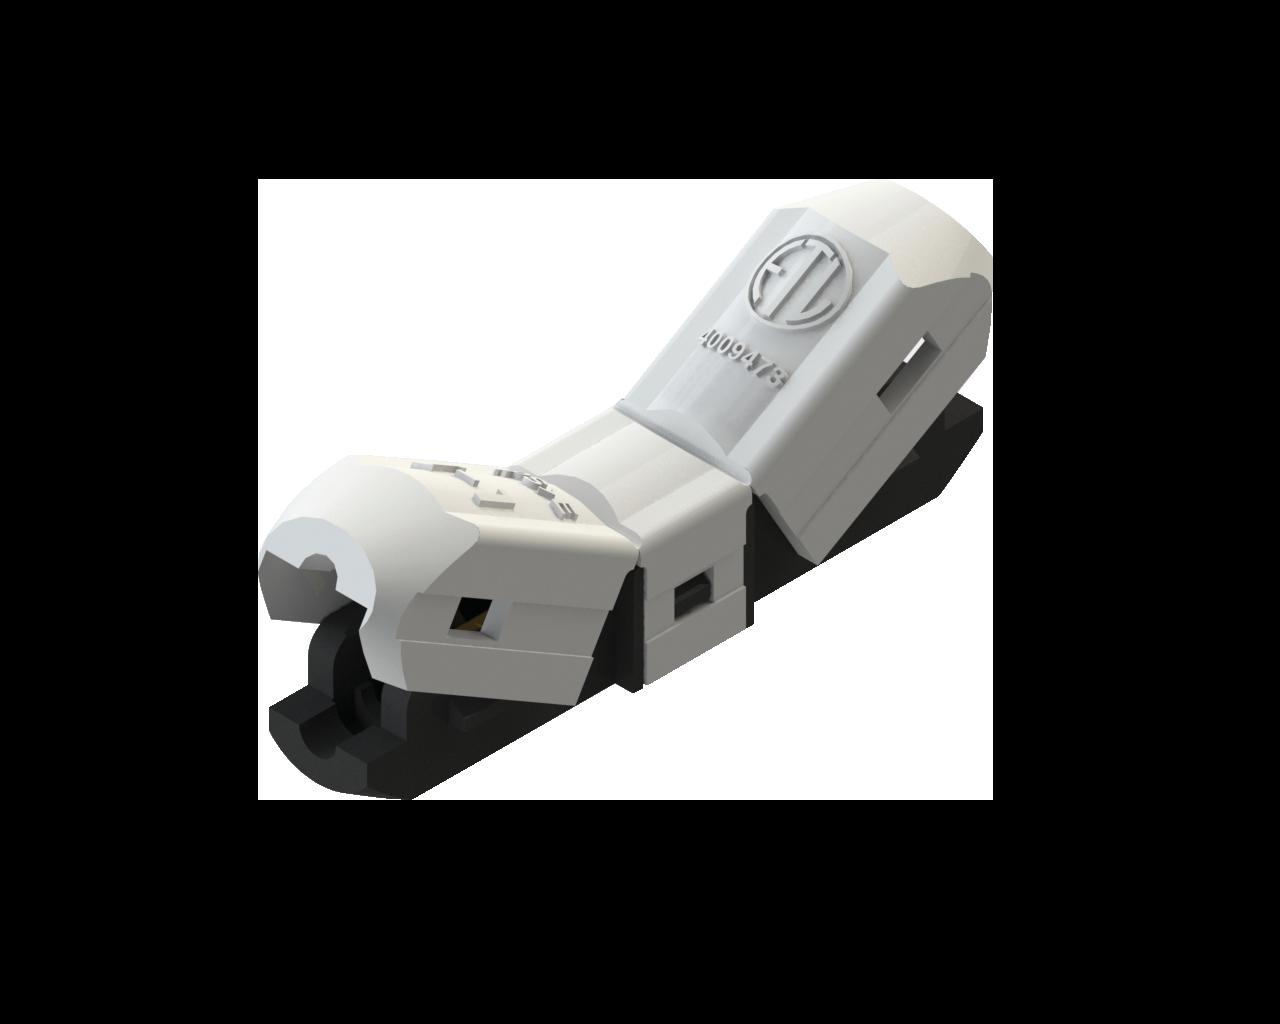 jowx connector